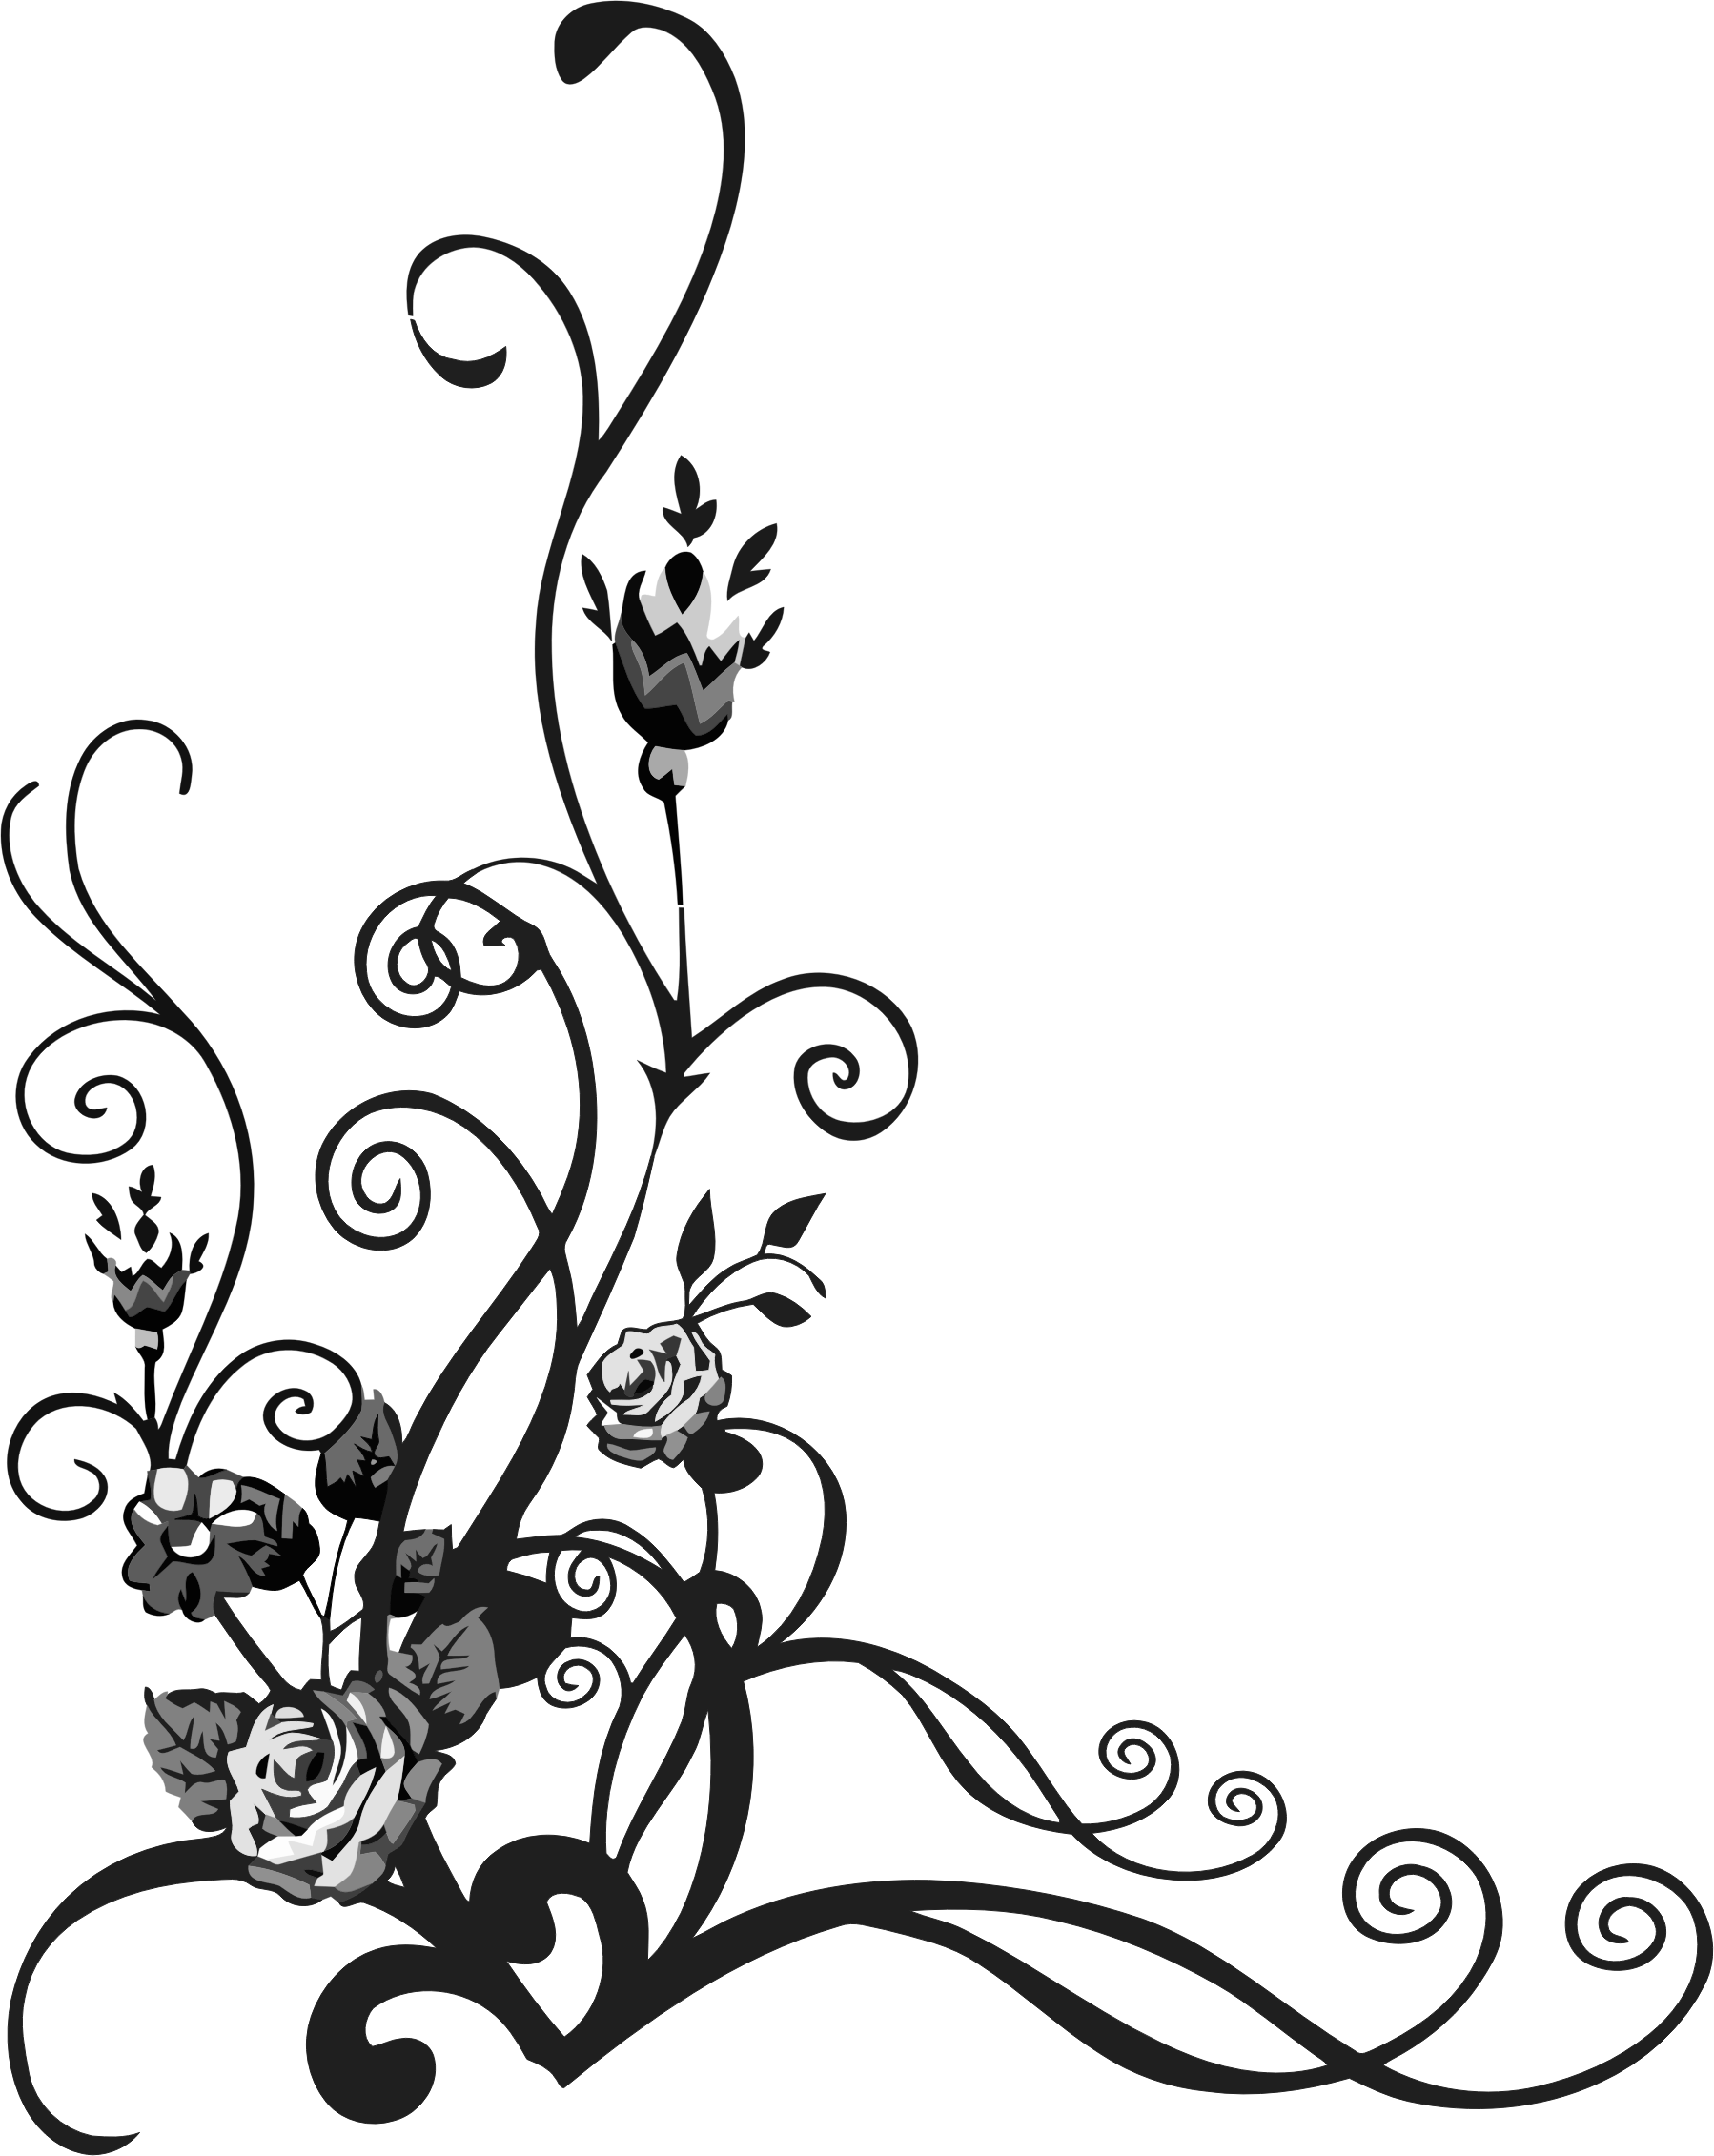 Clipart - Rose Floral Flourish 3